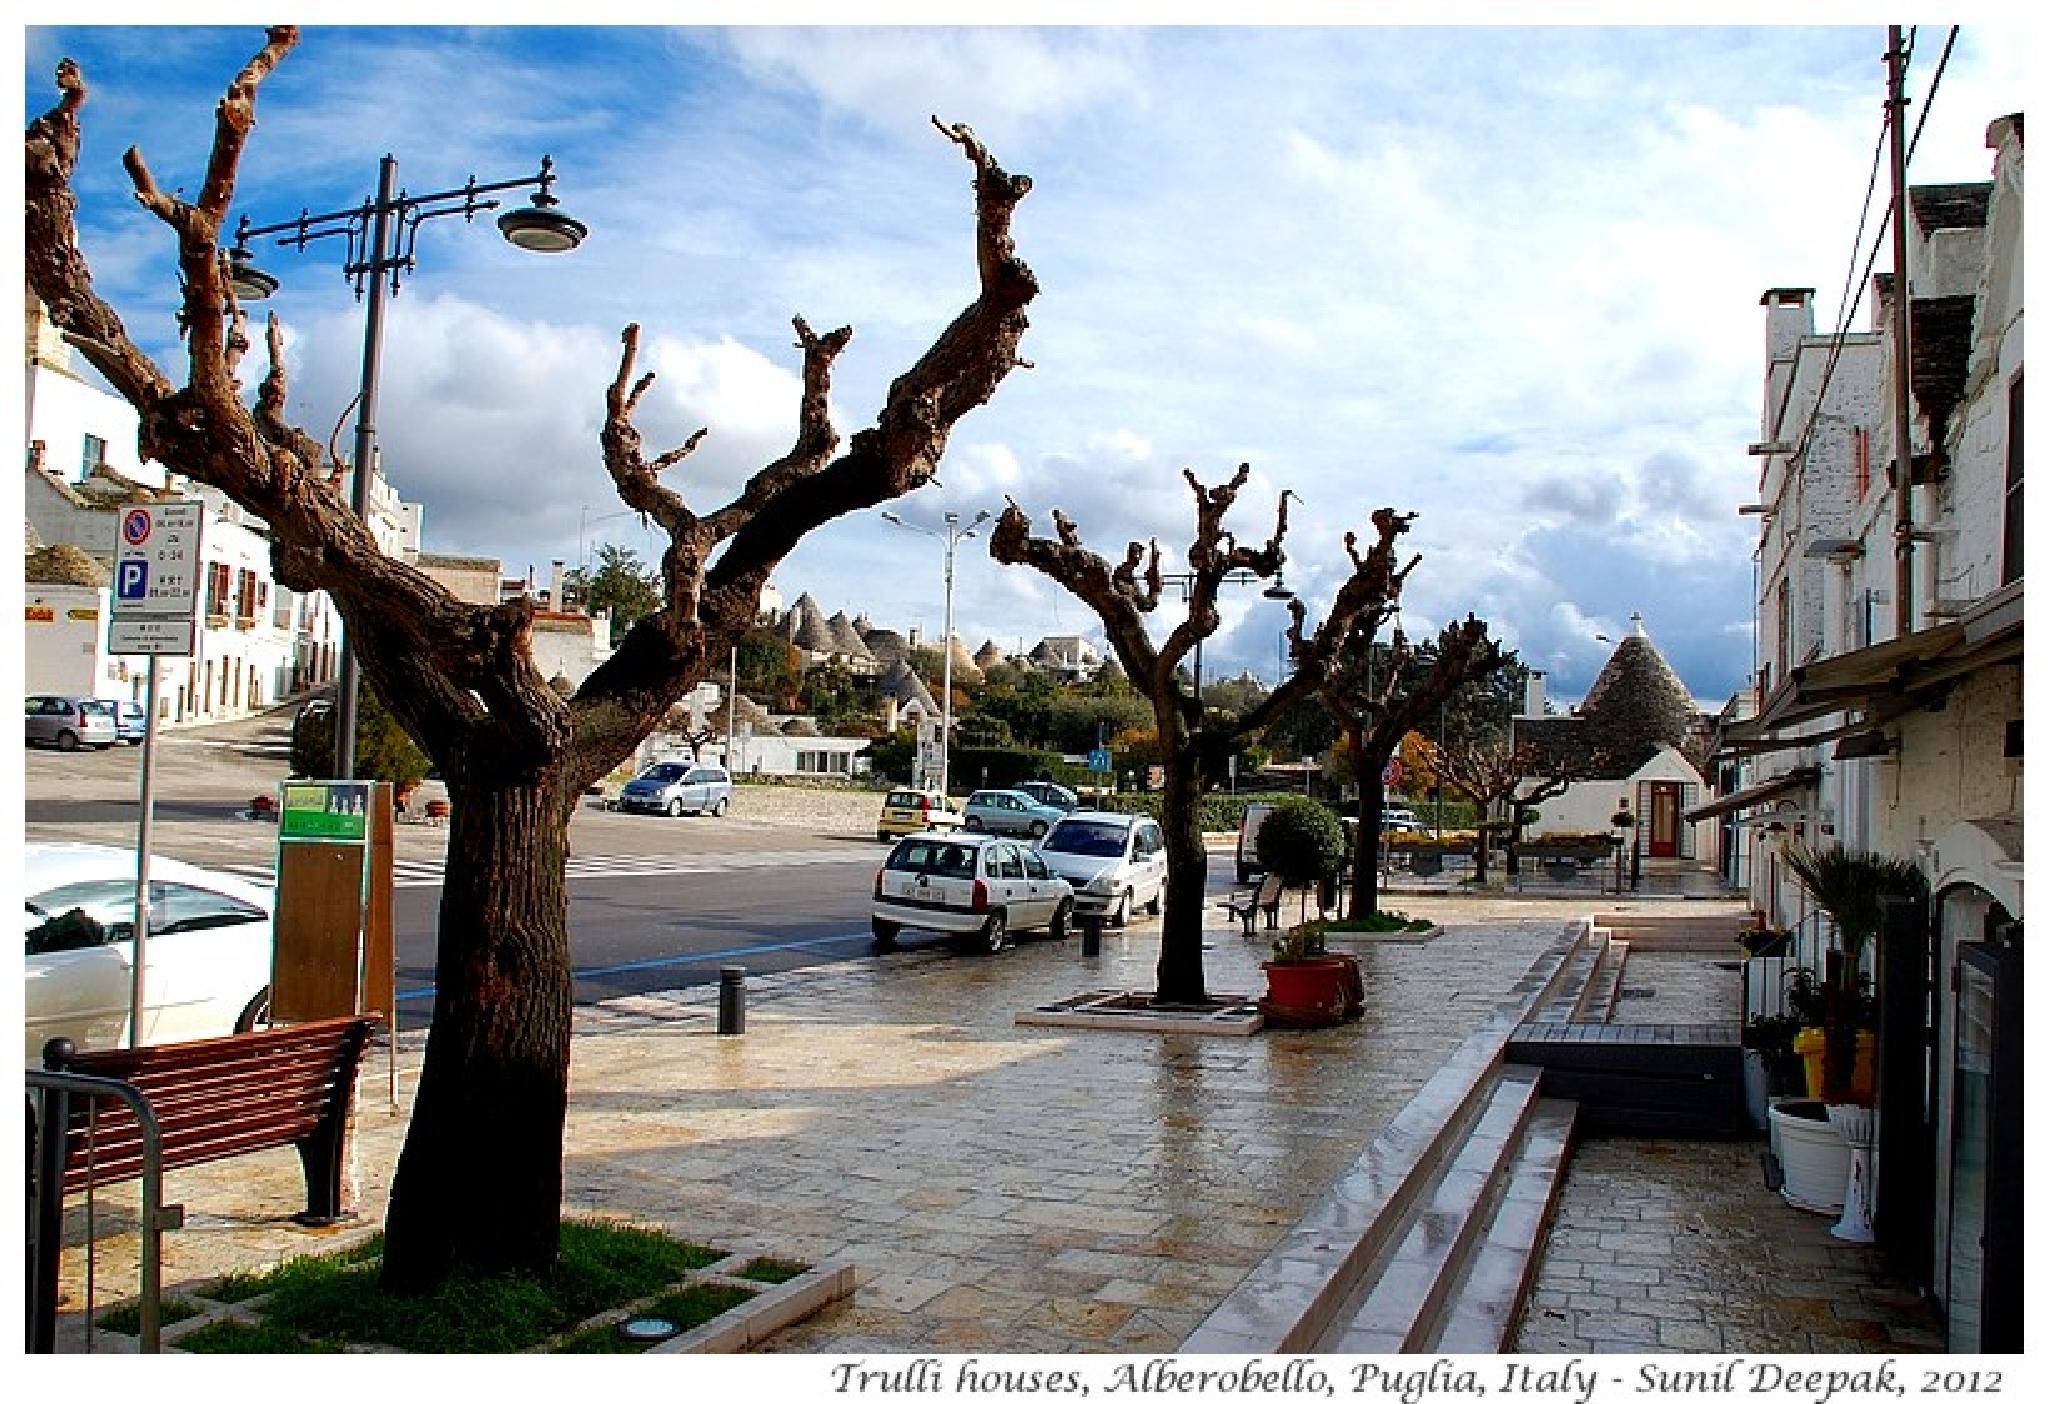 A street of Alberobello by Dr Sunil Deepak